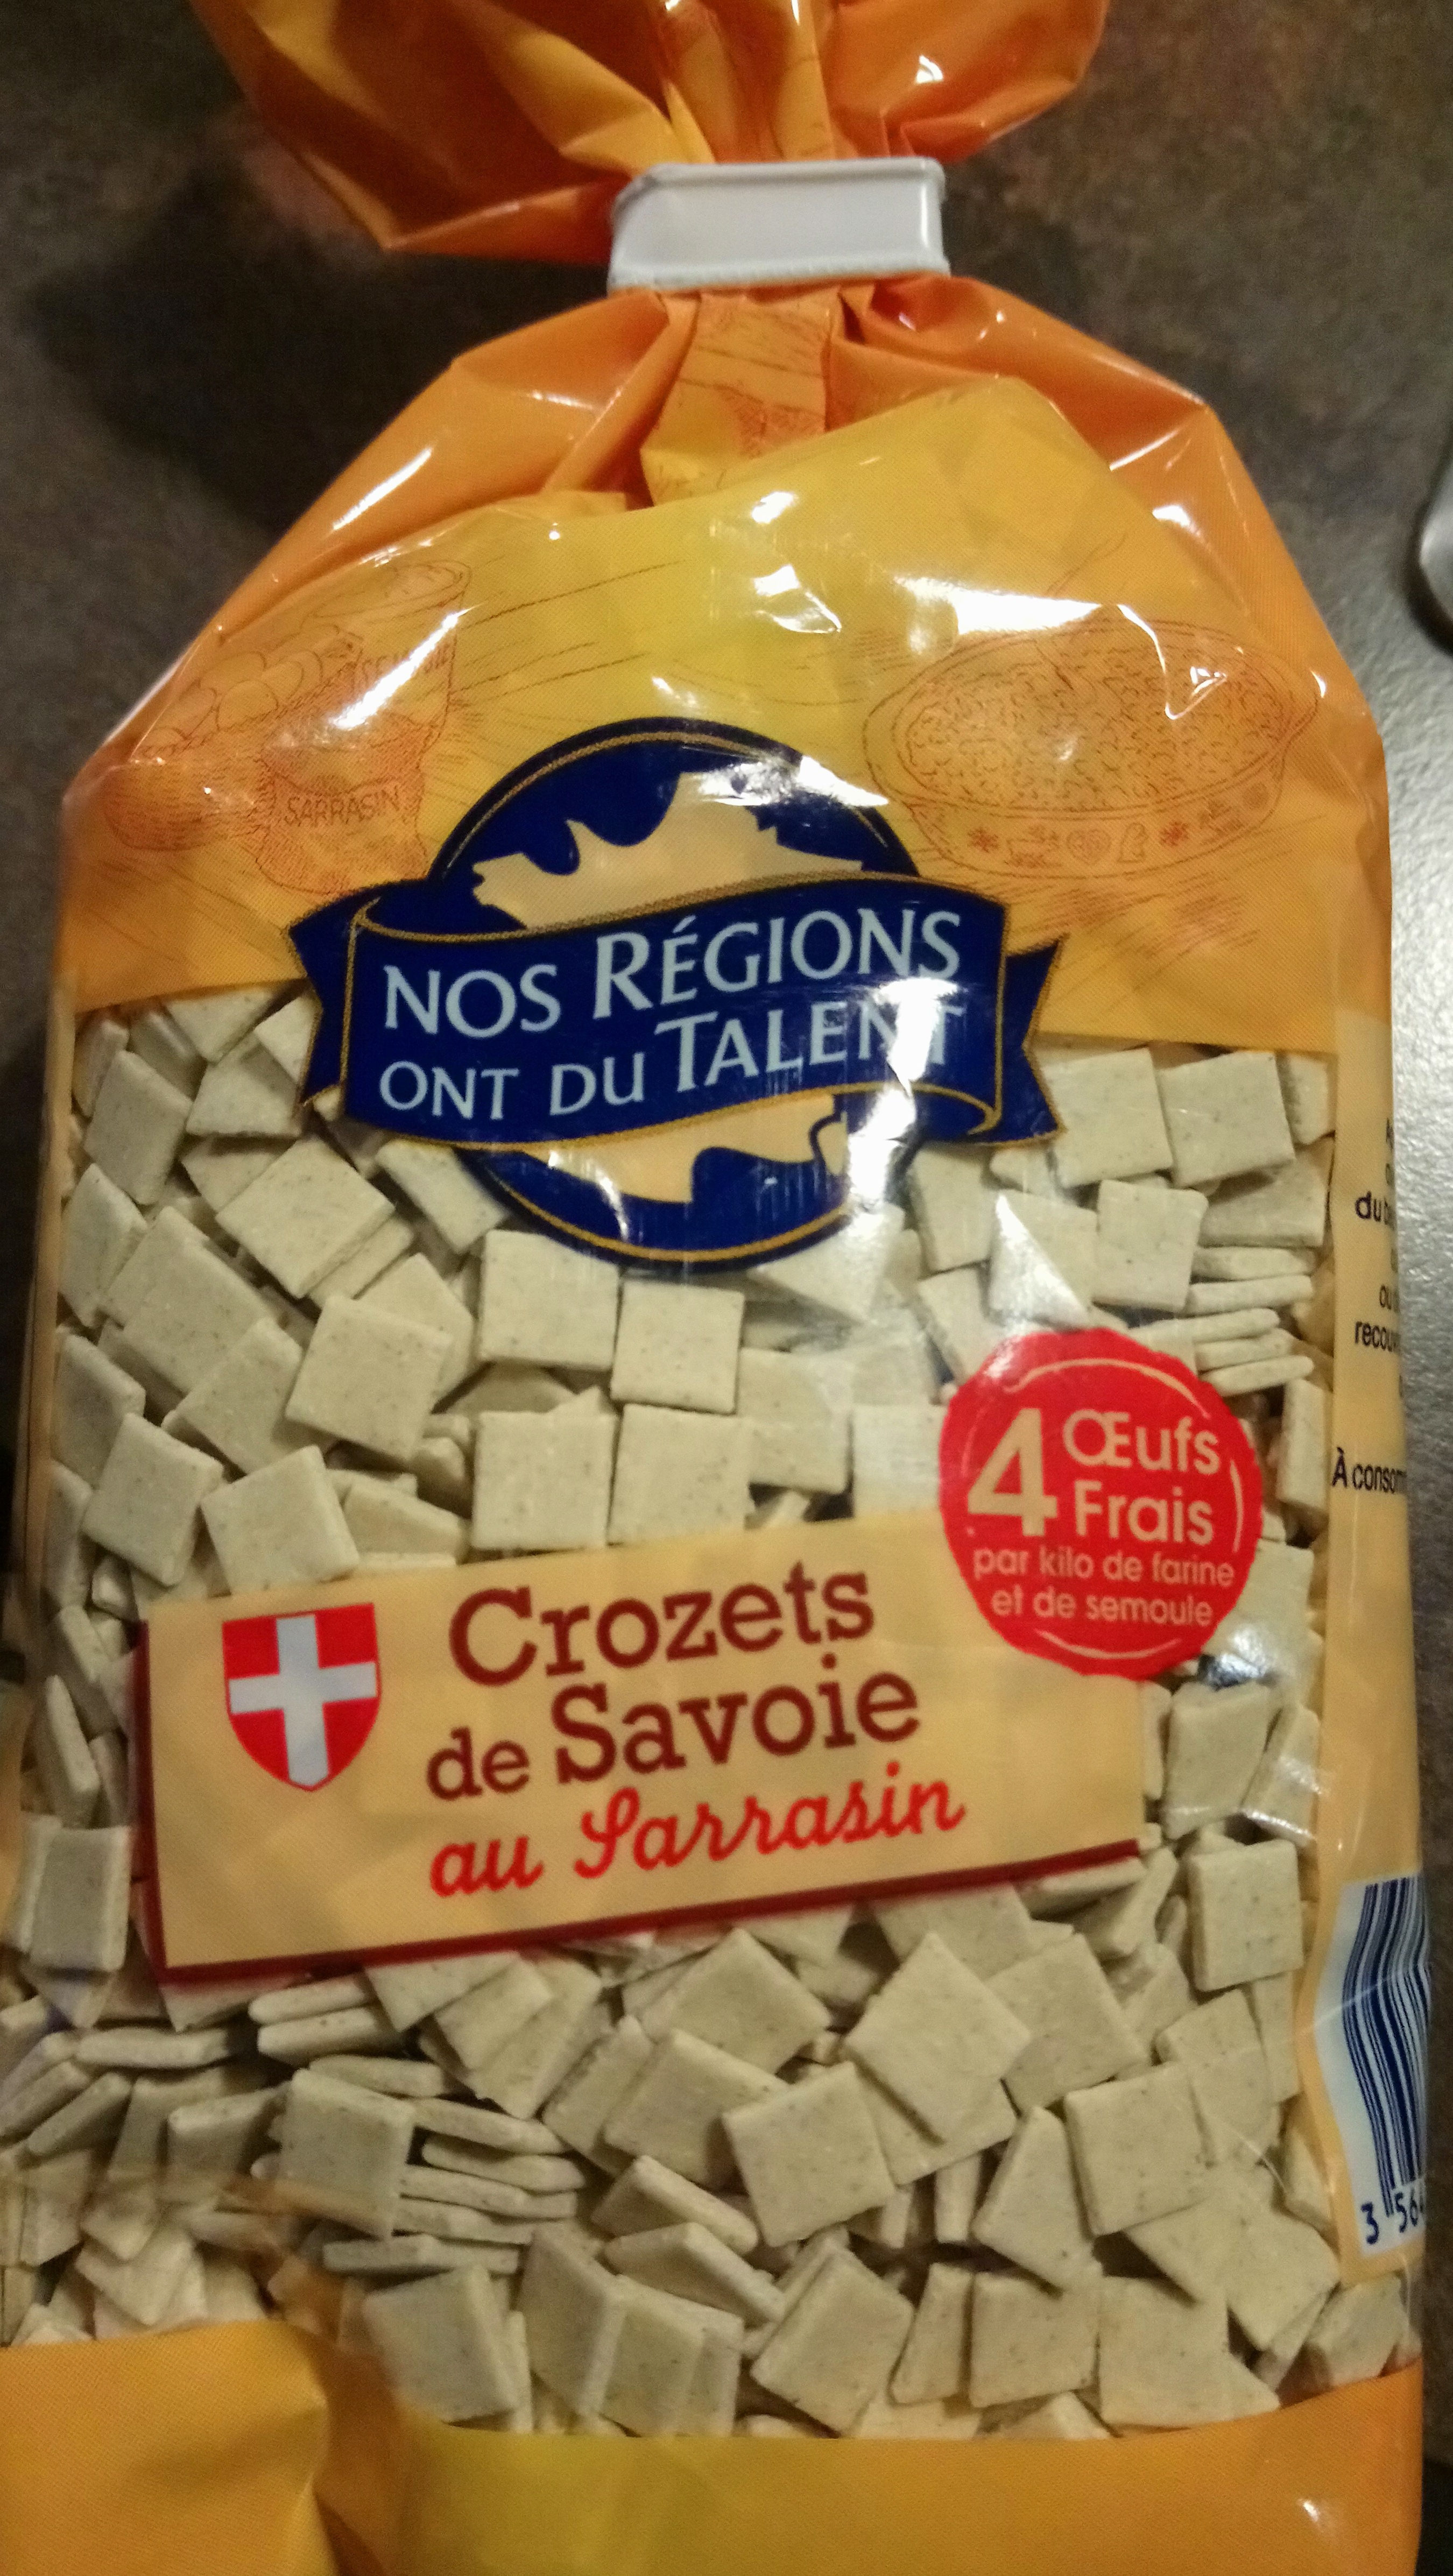 Pates crozets au Sarrasin - Produkt - fr